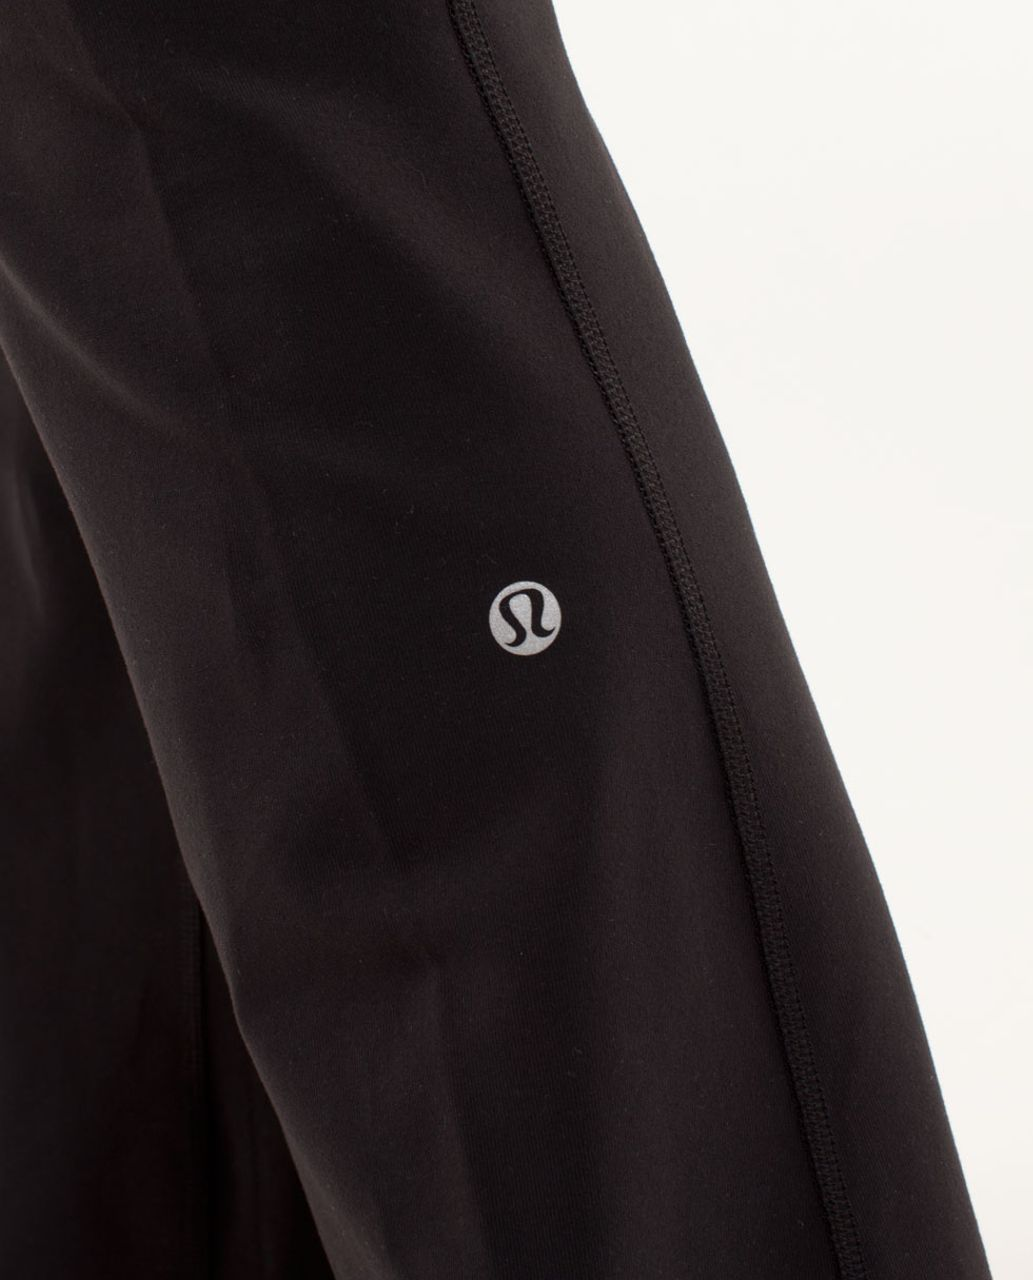 Lululemon Groove Pant *New (Regular) - Black / Quilting Winter 11